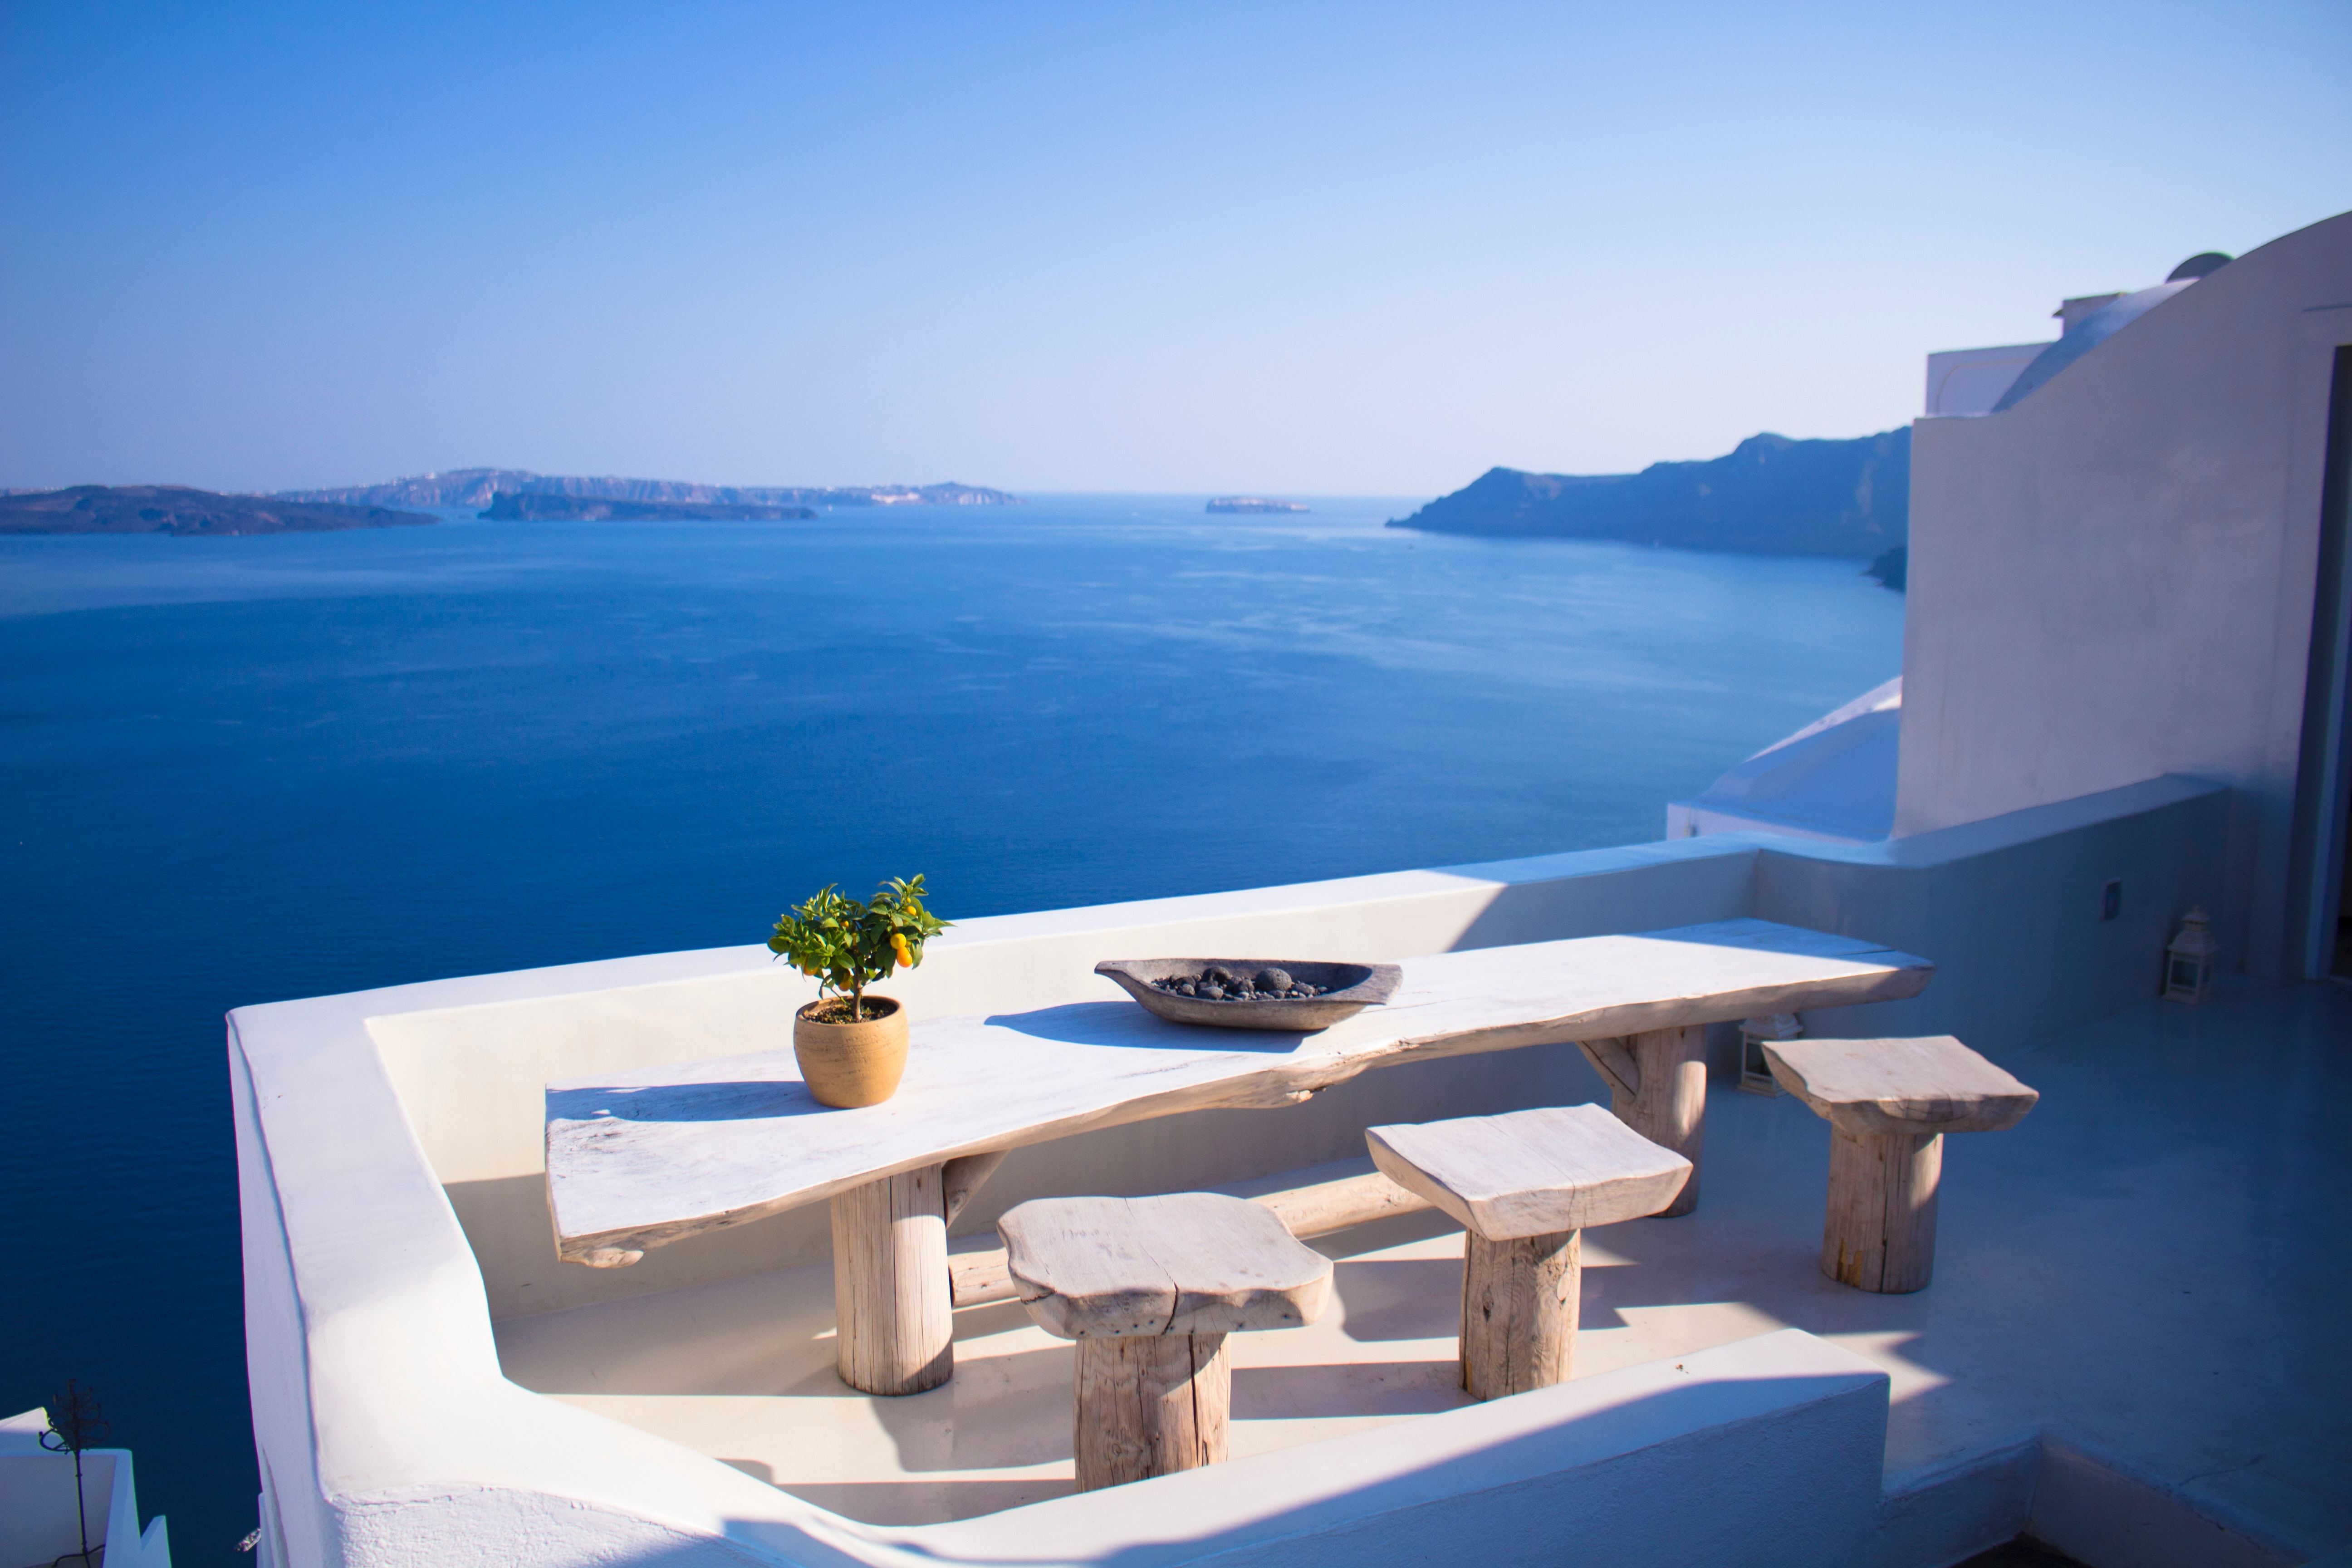 15 Best Cafes in Santorini